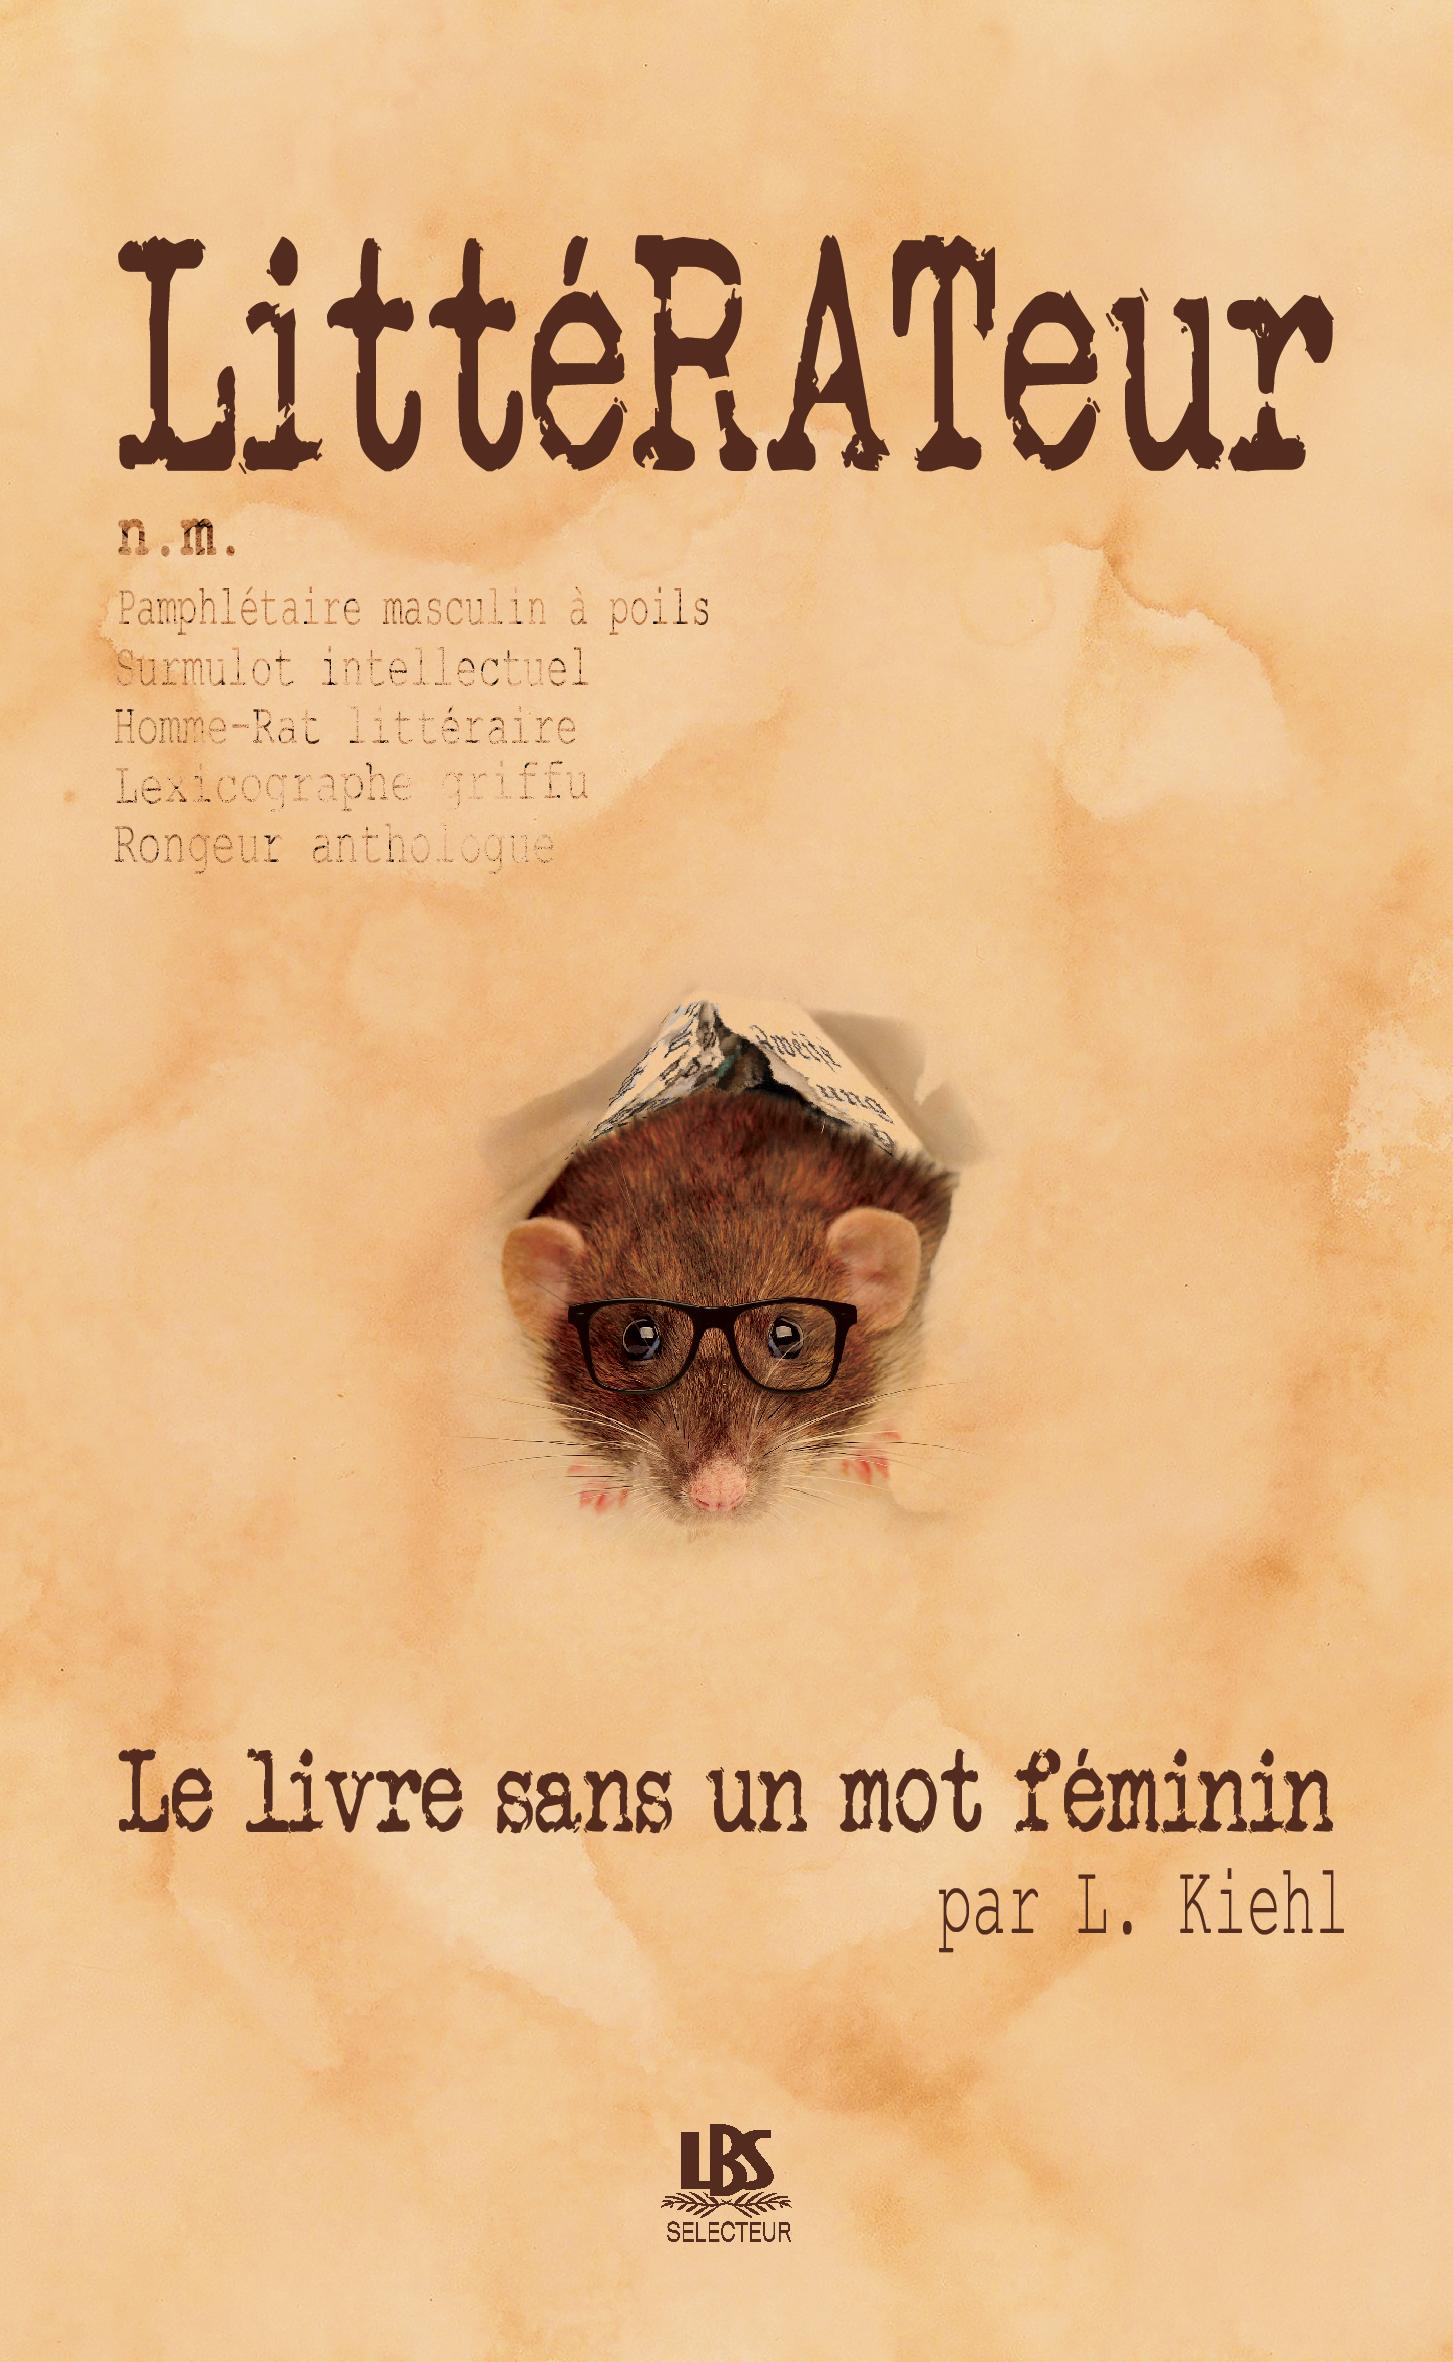 LittéRATeur - Laurence Kiehl